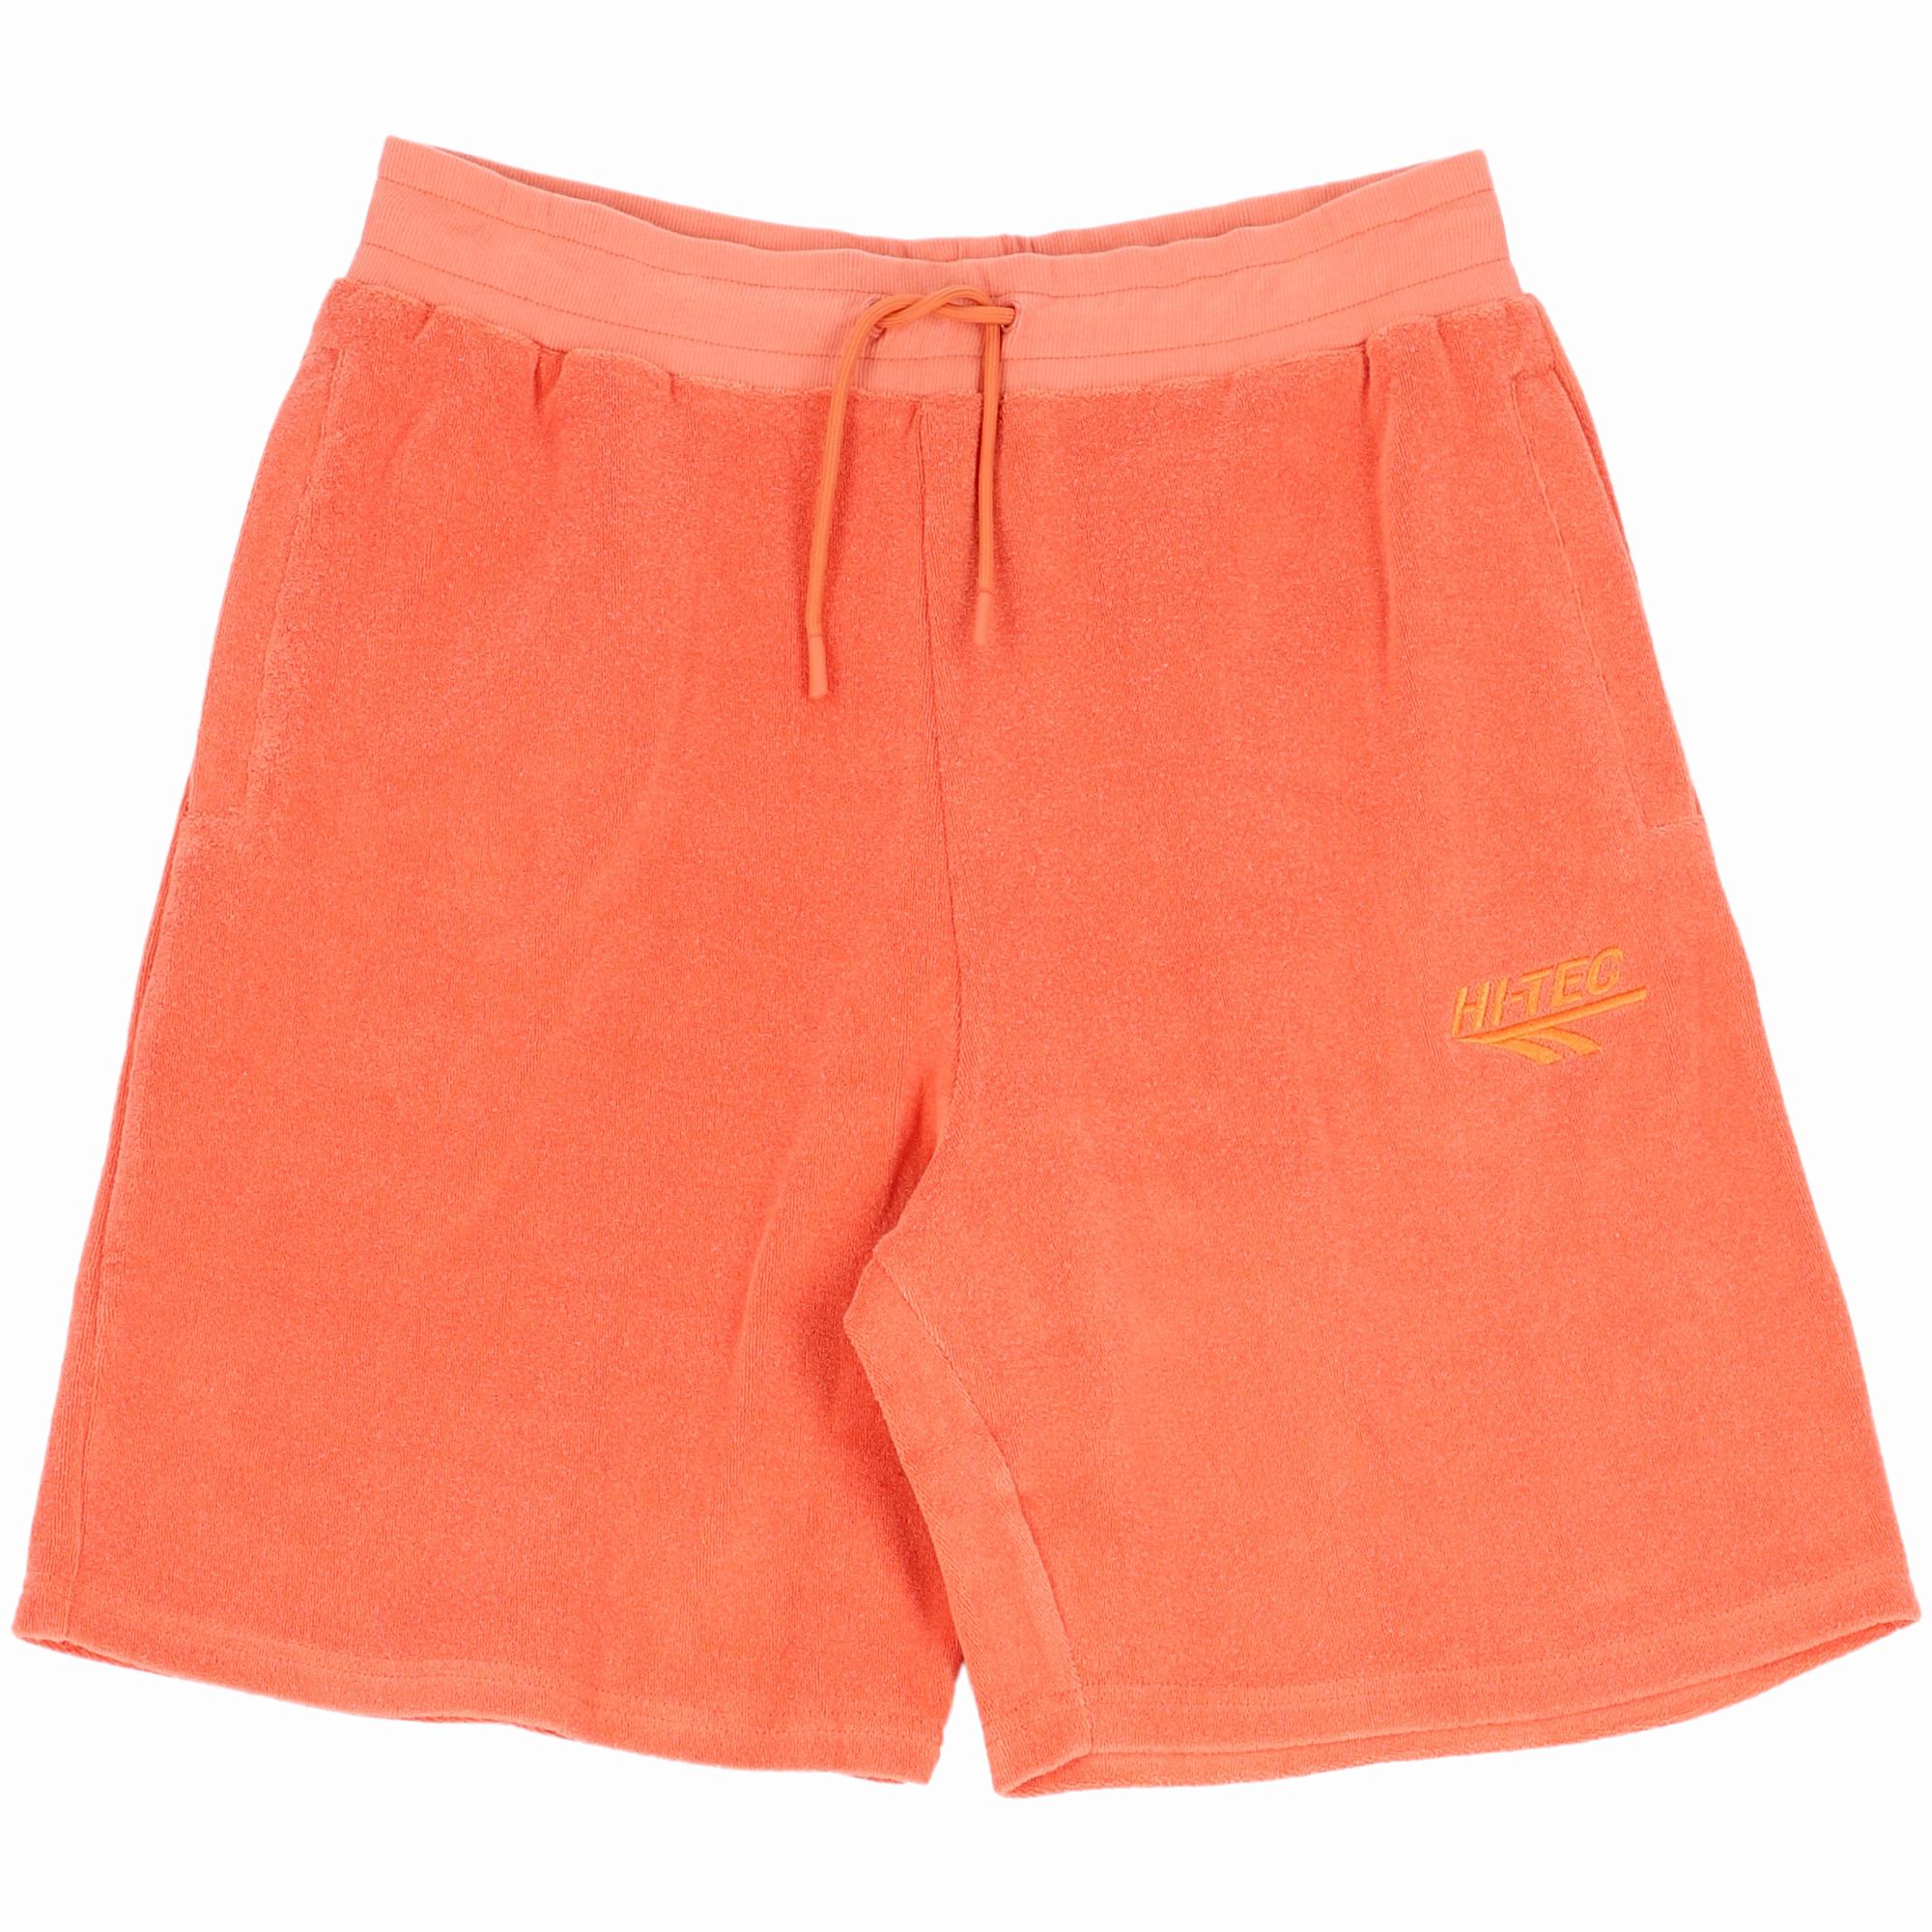 HI-TEC Martin shorts, arabesque, small